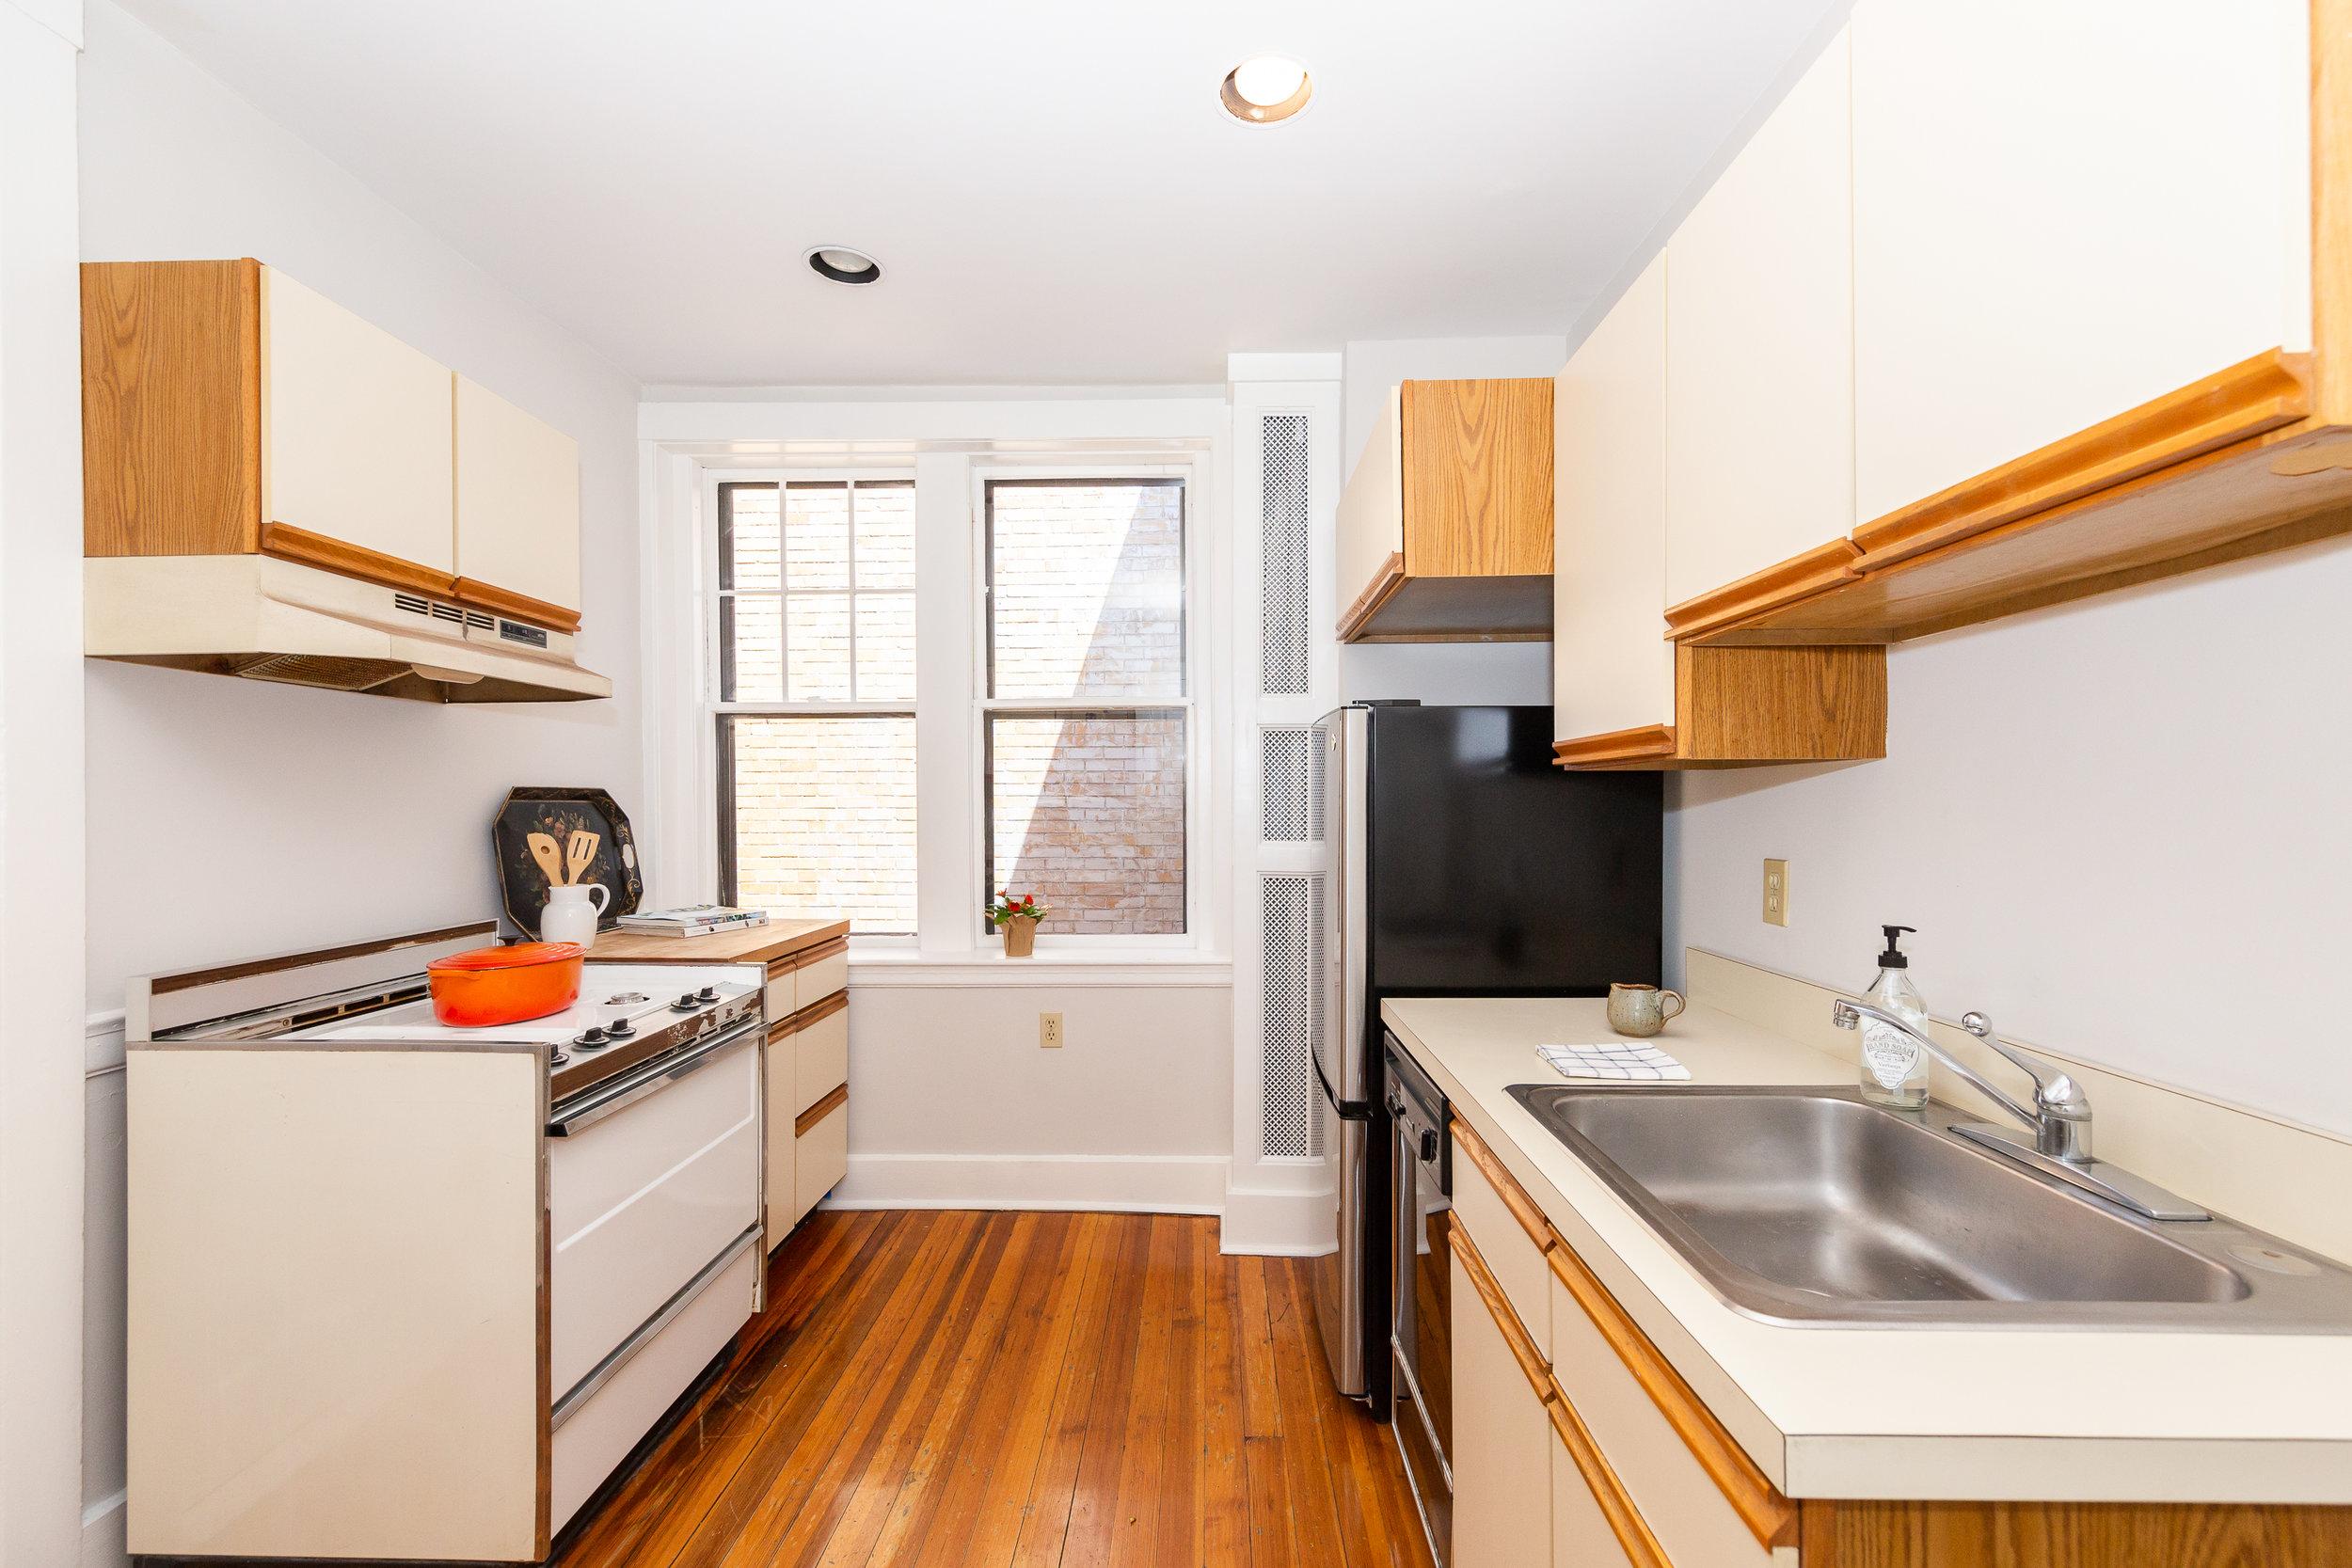 1783 Massachusetts Ave, Cambridge, MA_Property-Precision-7.jpg